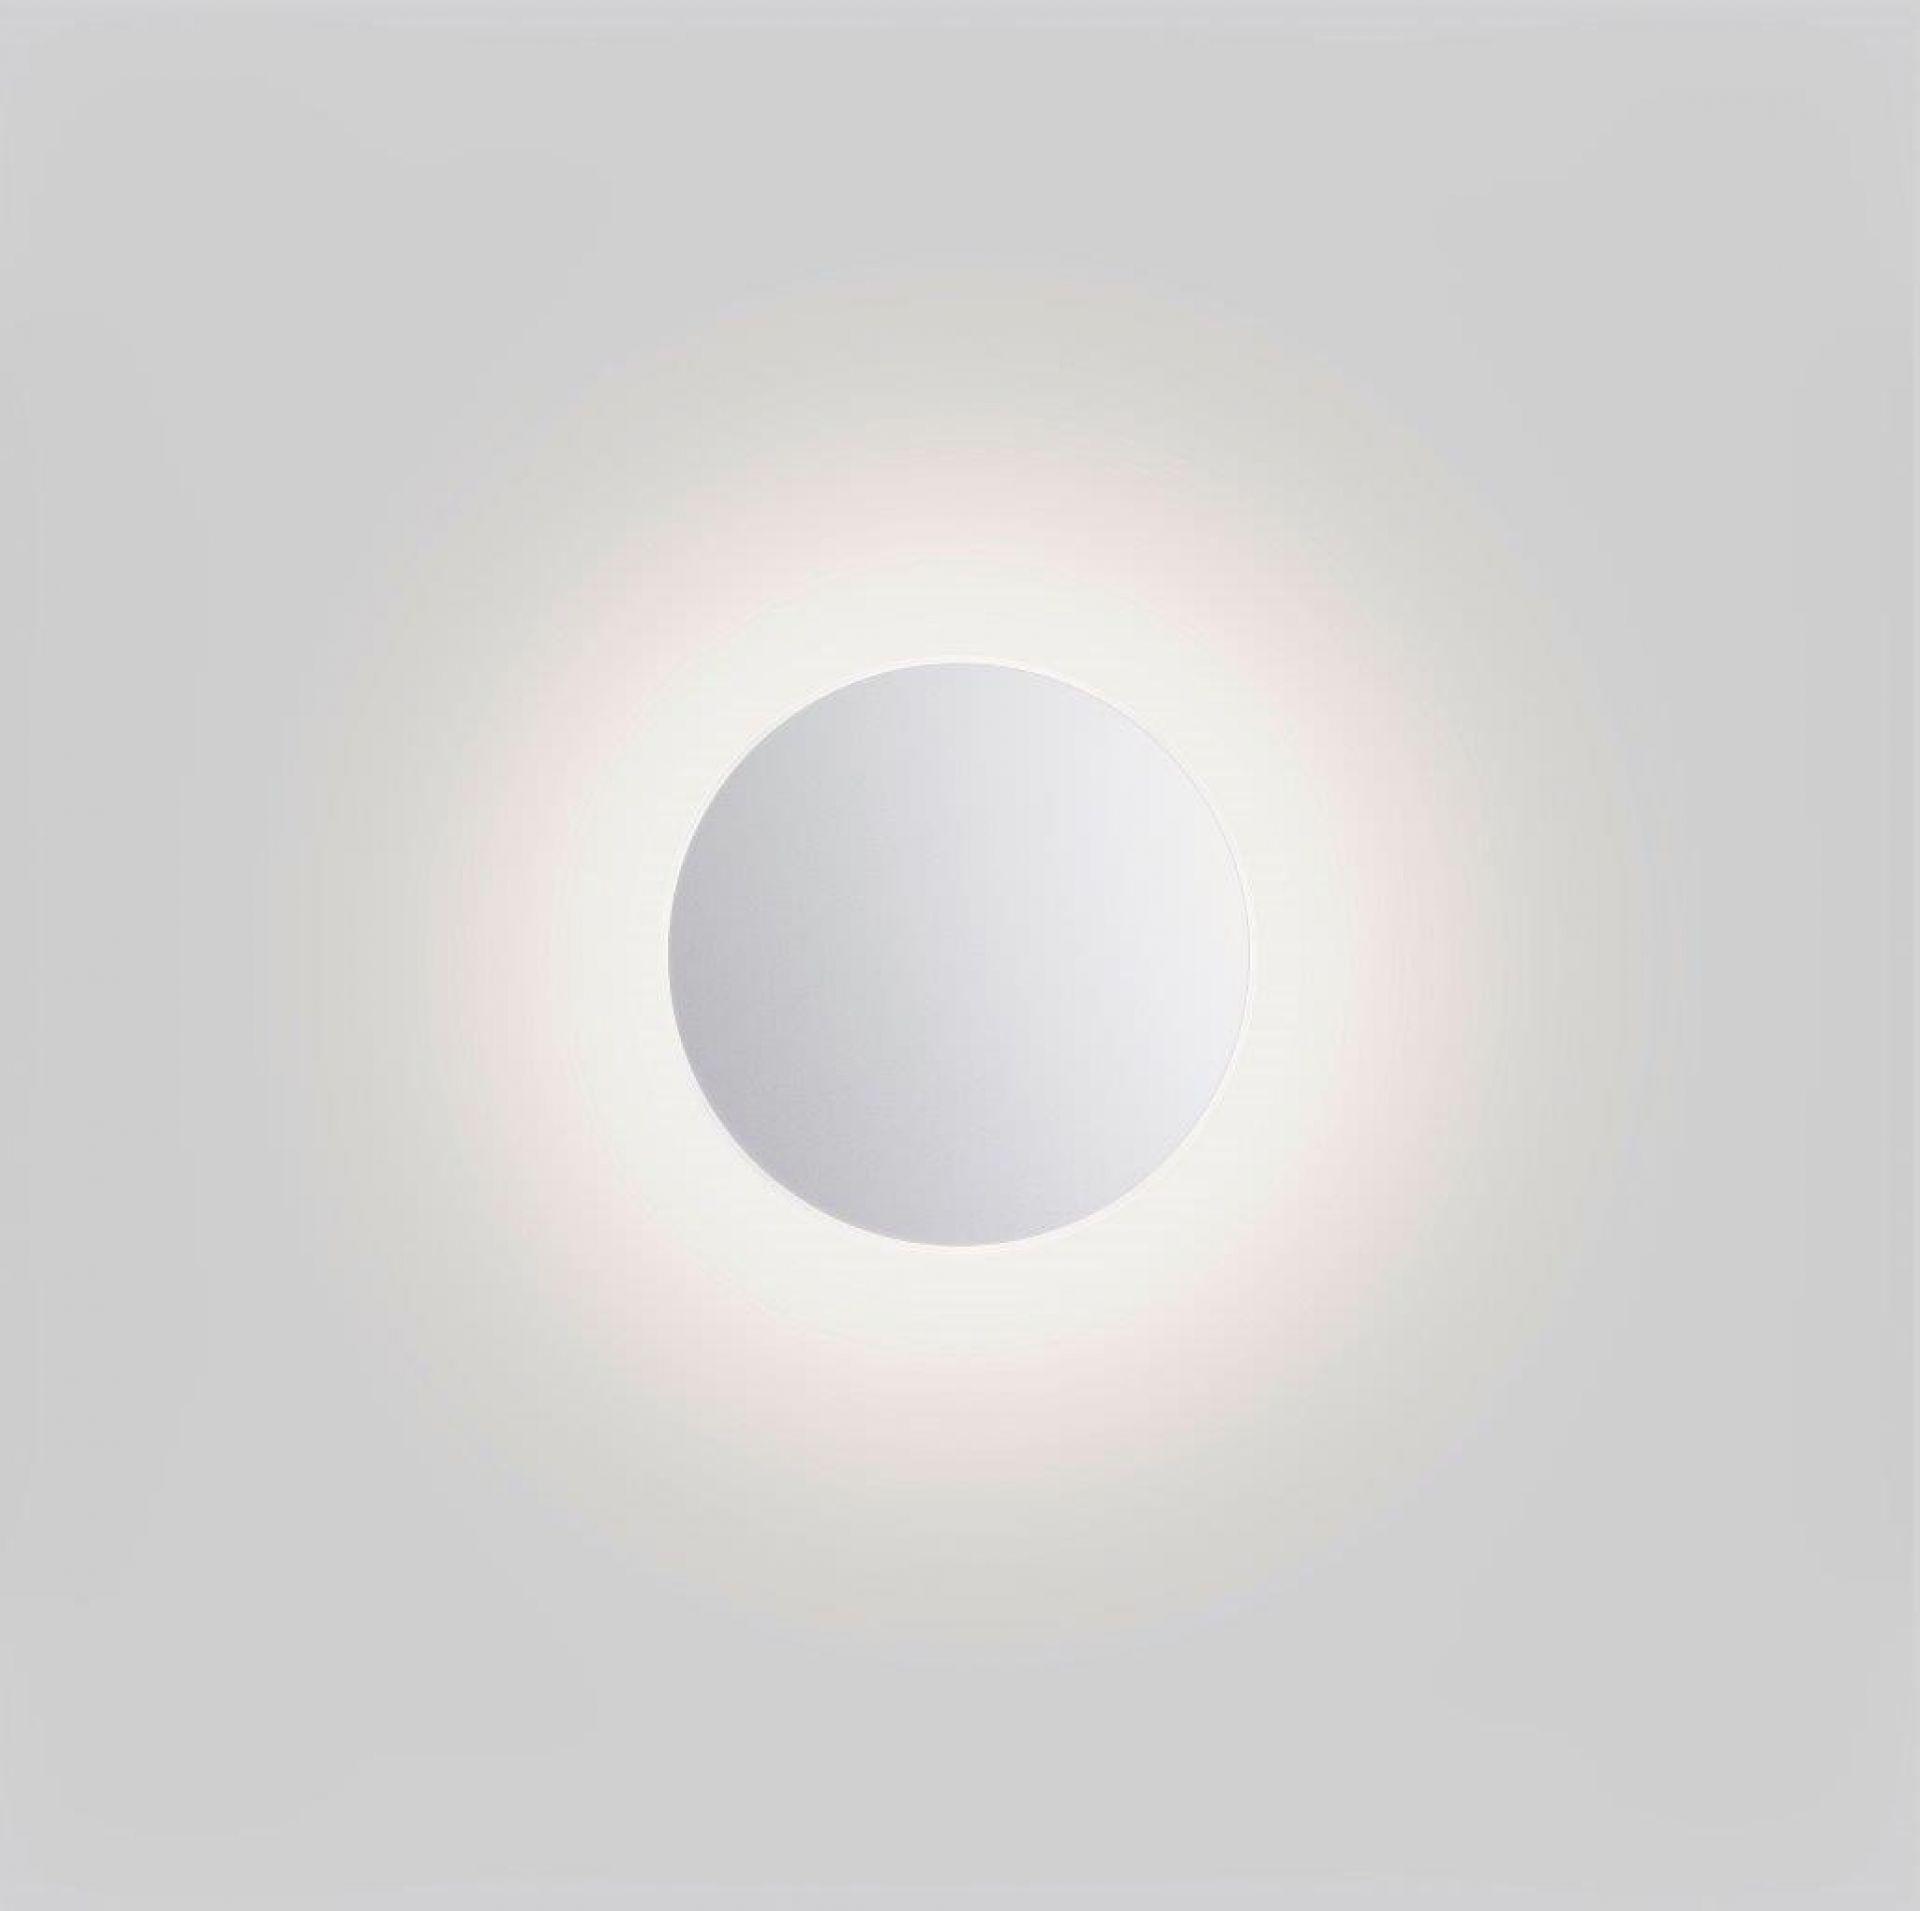 Lid LED-Wandleuchte Serien Lighting-Aluminium champagner eloxiert